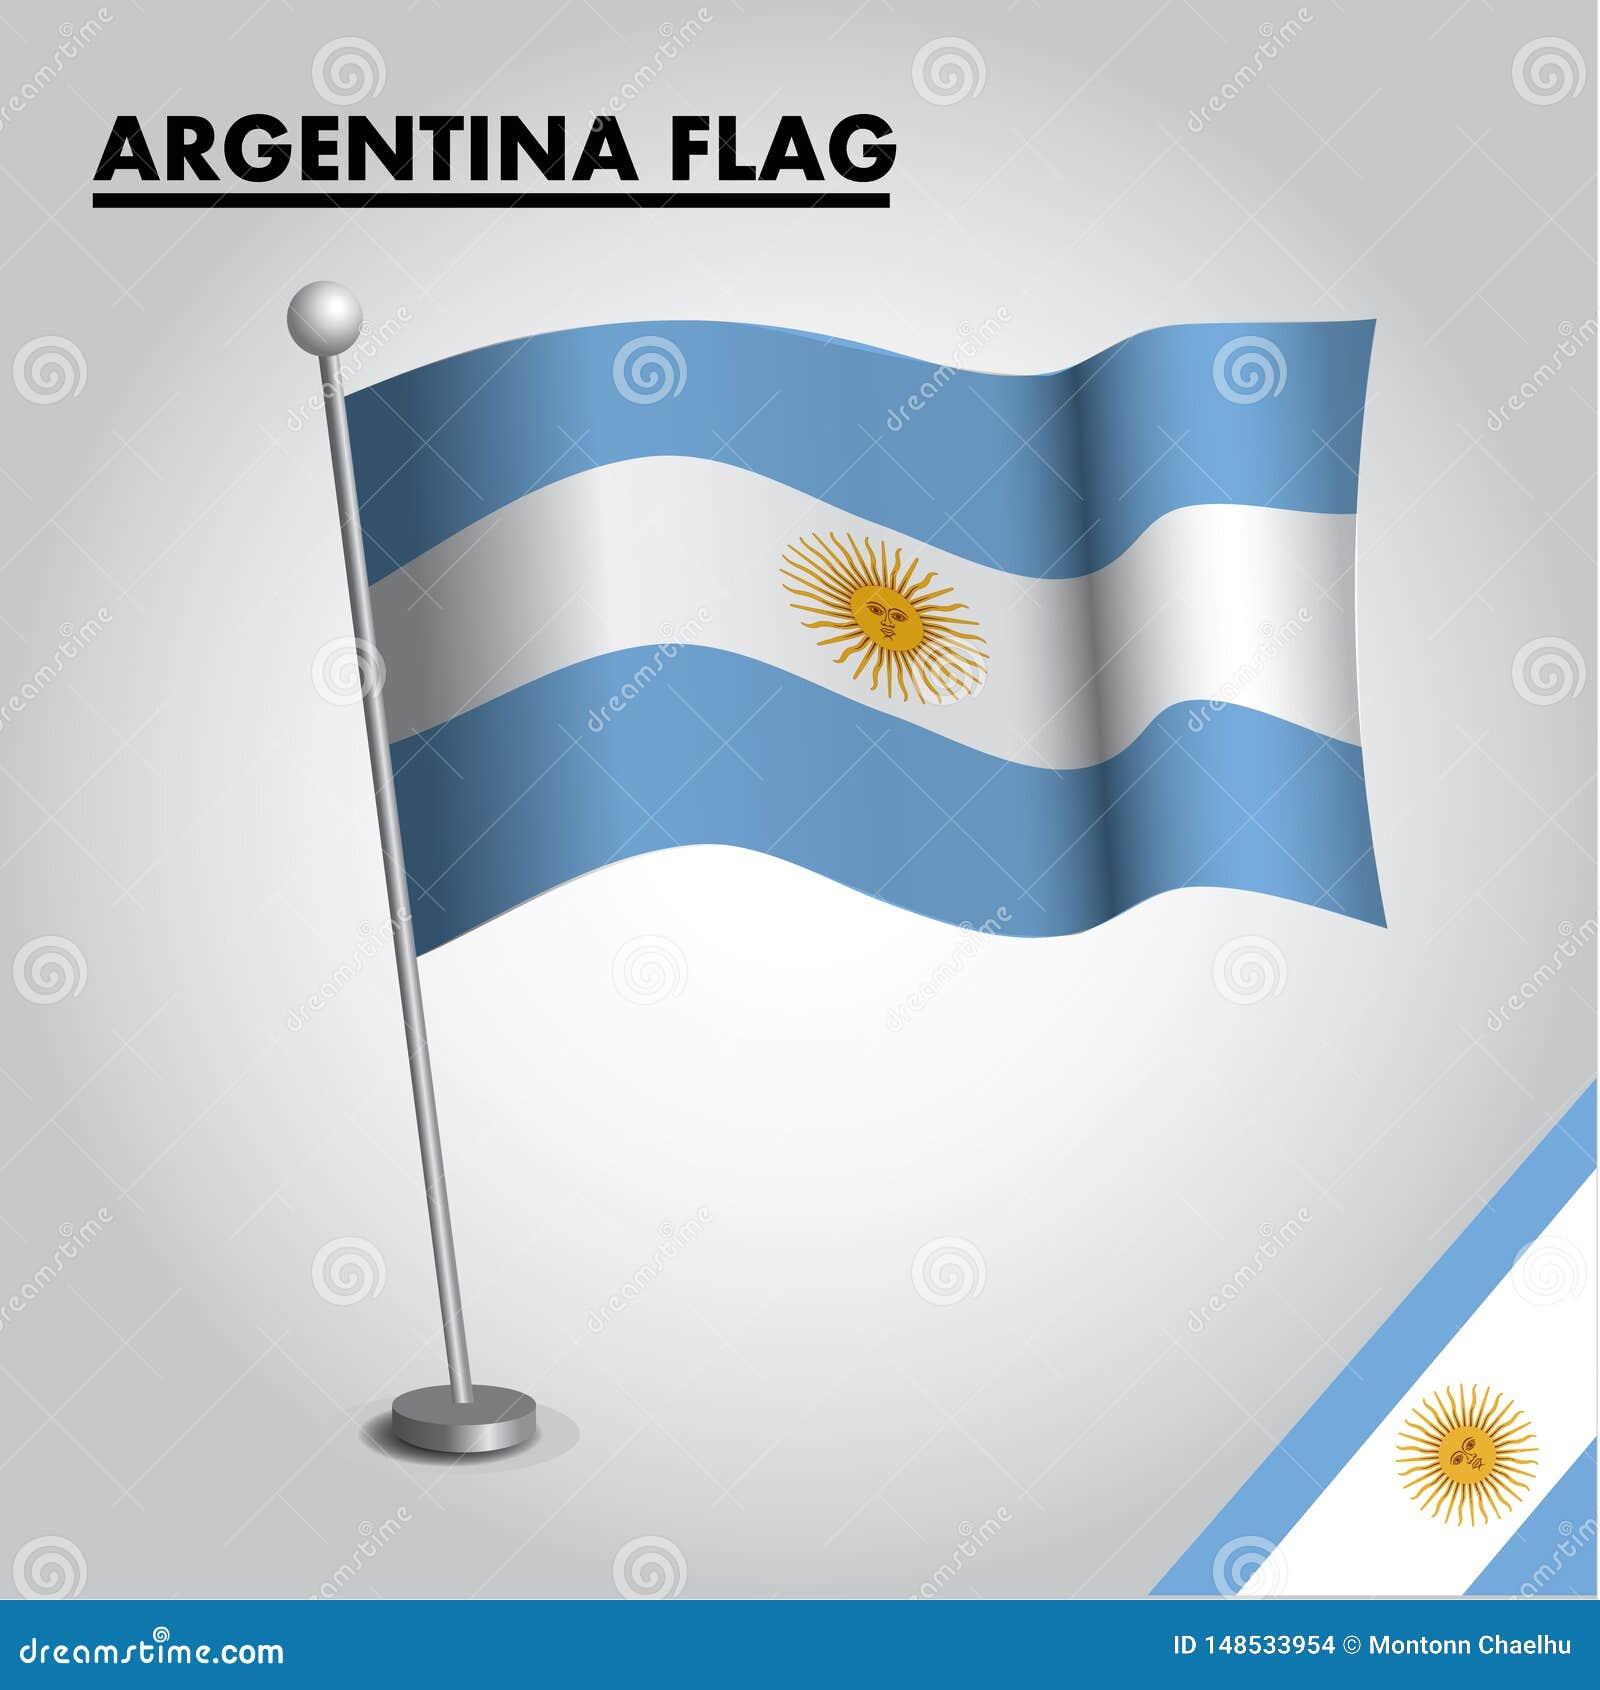 Argentina flag National flag of Argentina on a pole